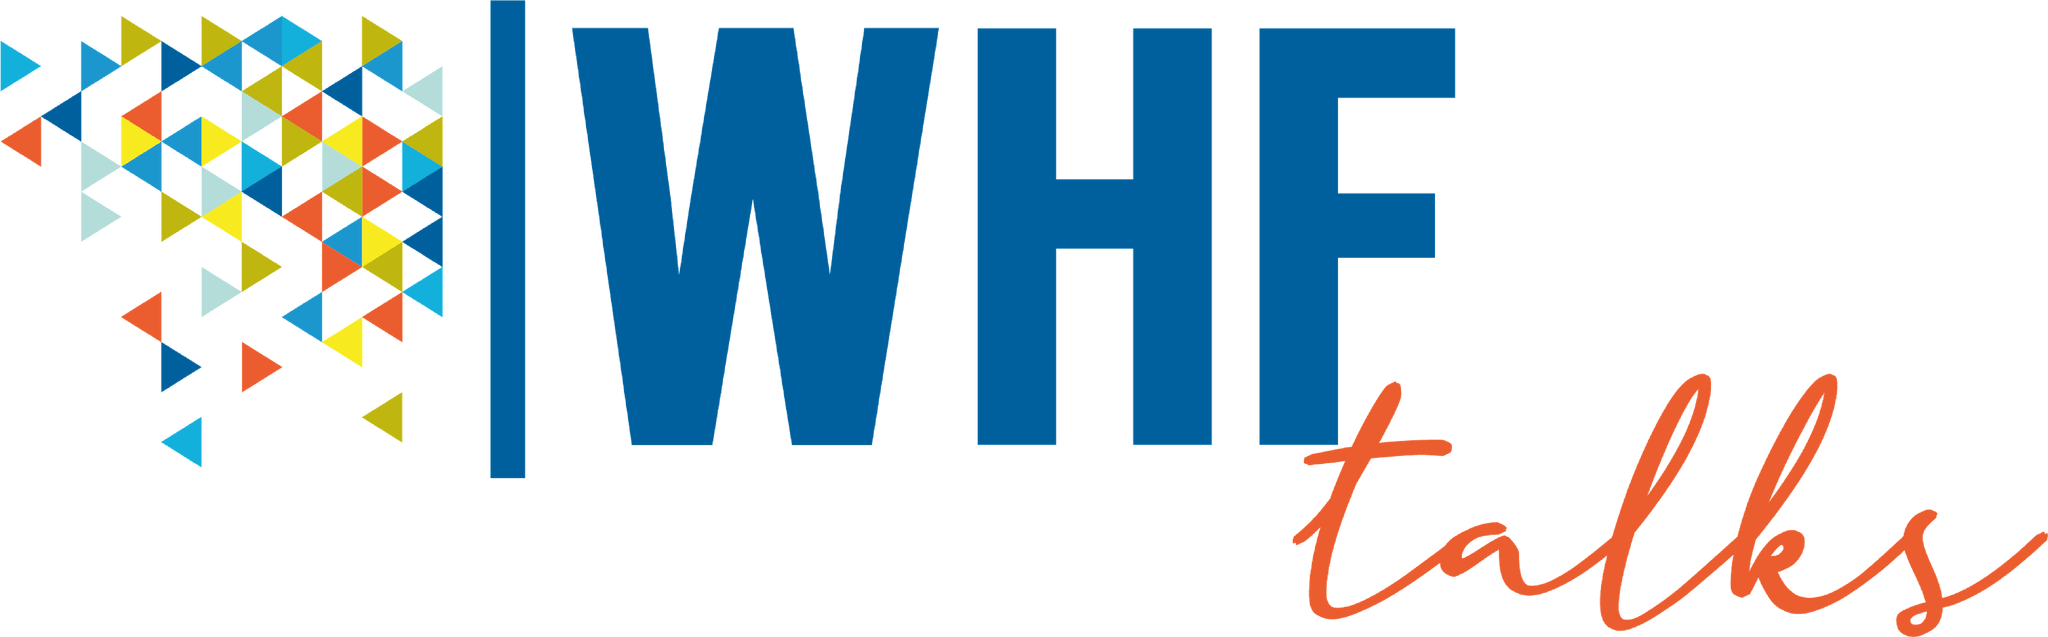 WHFTalks